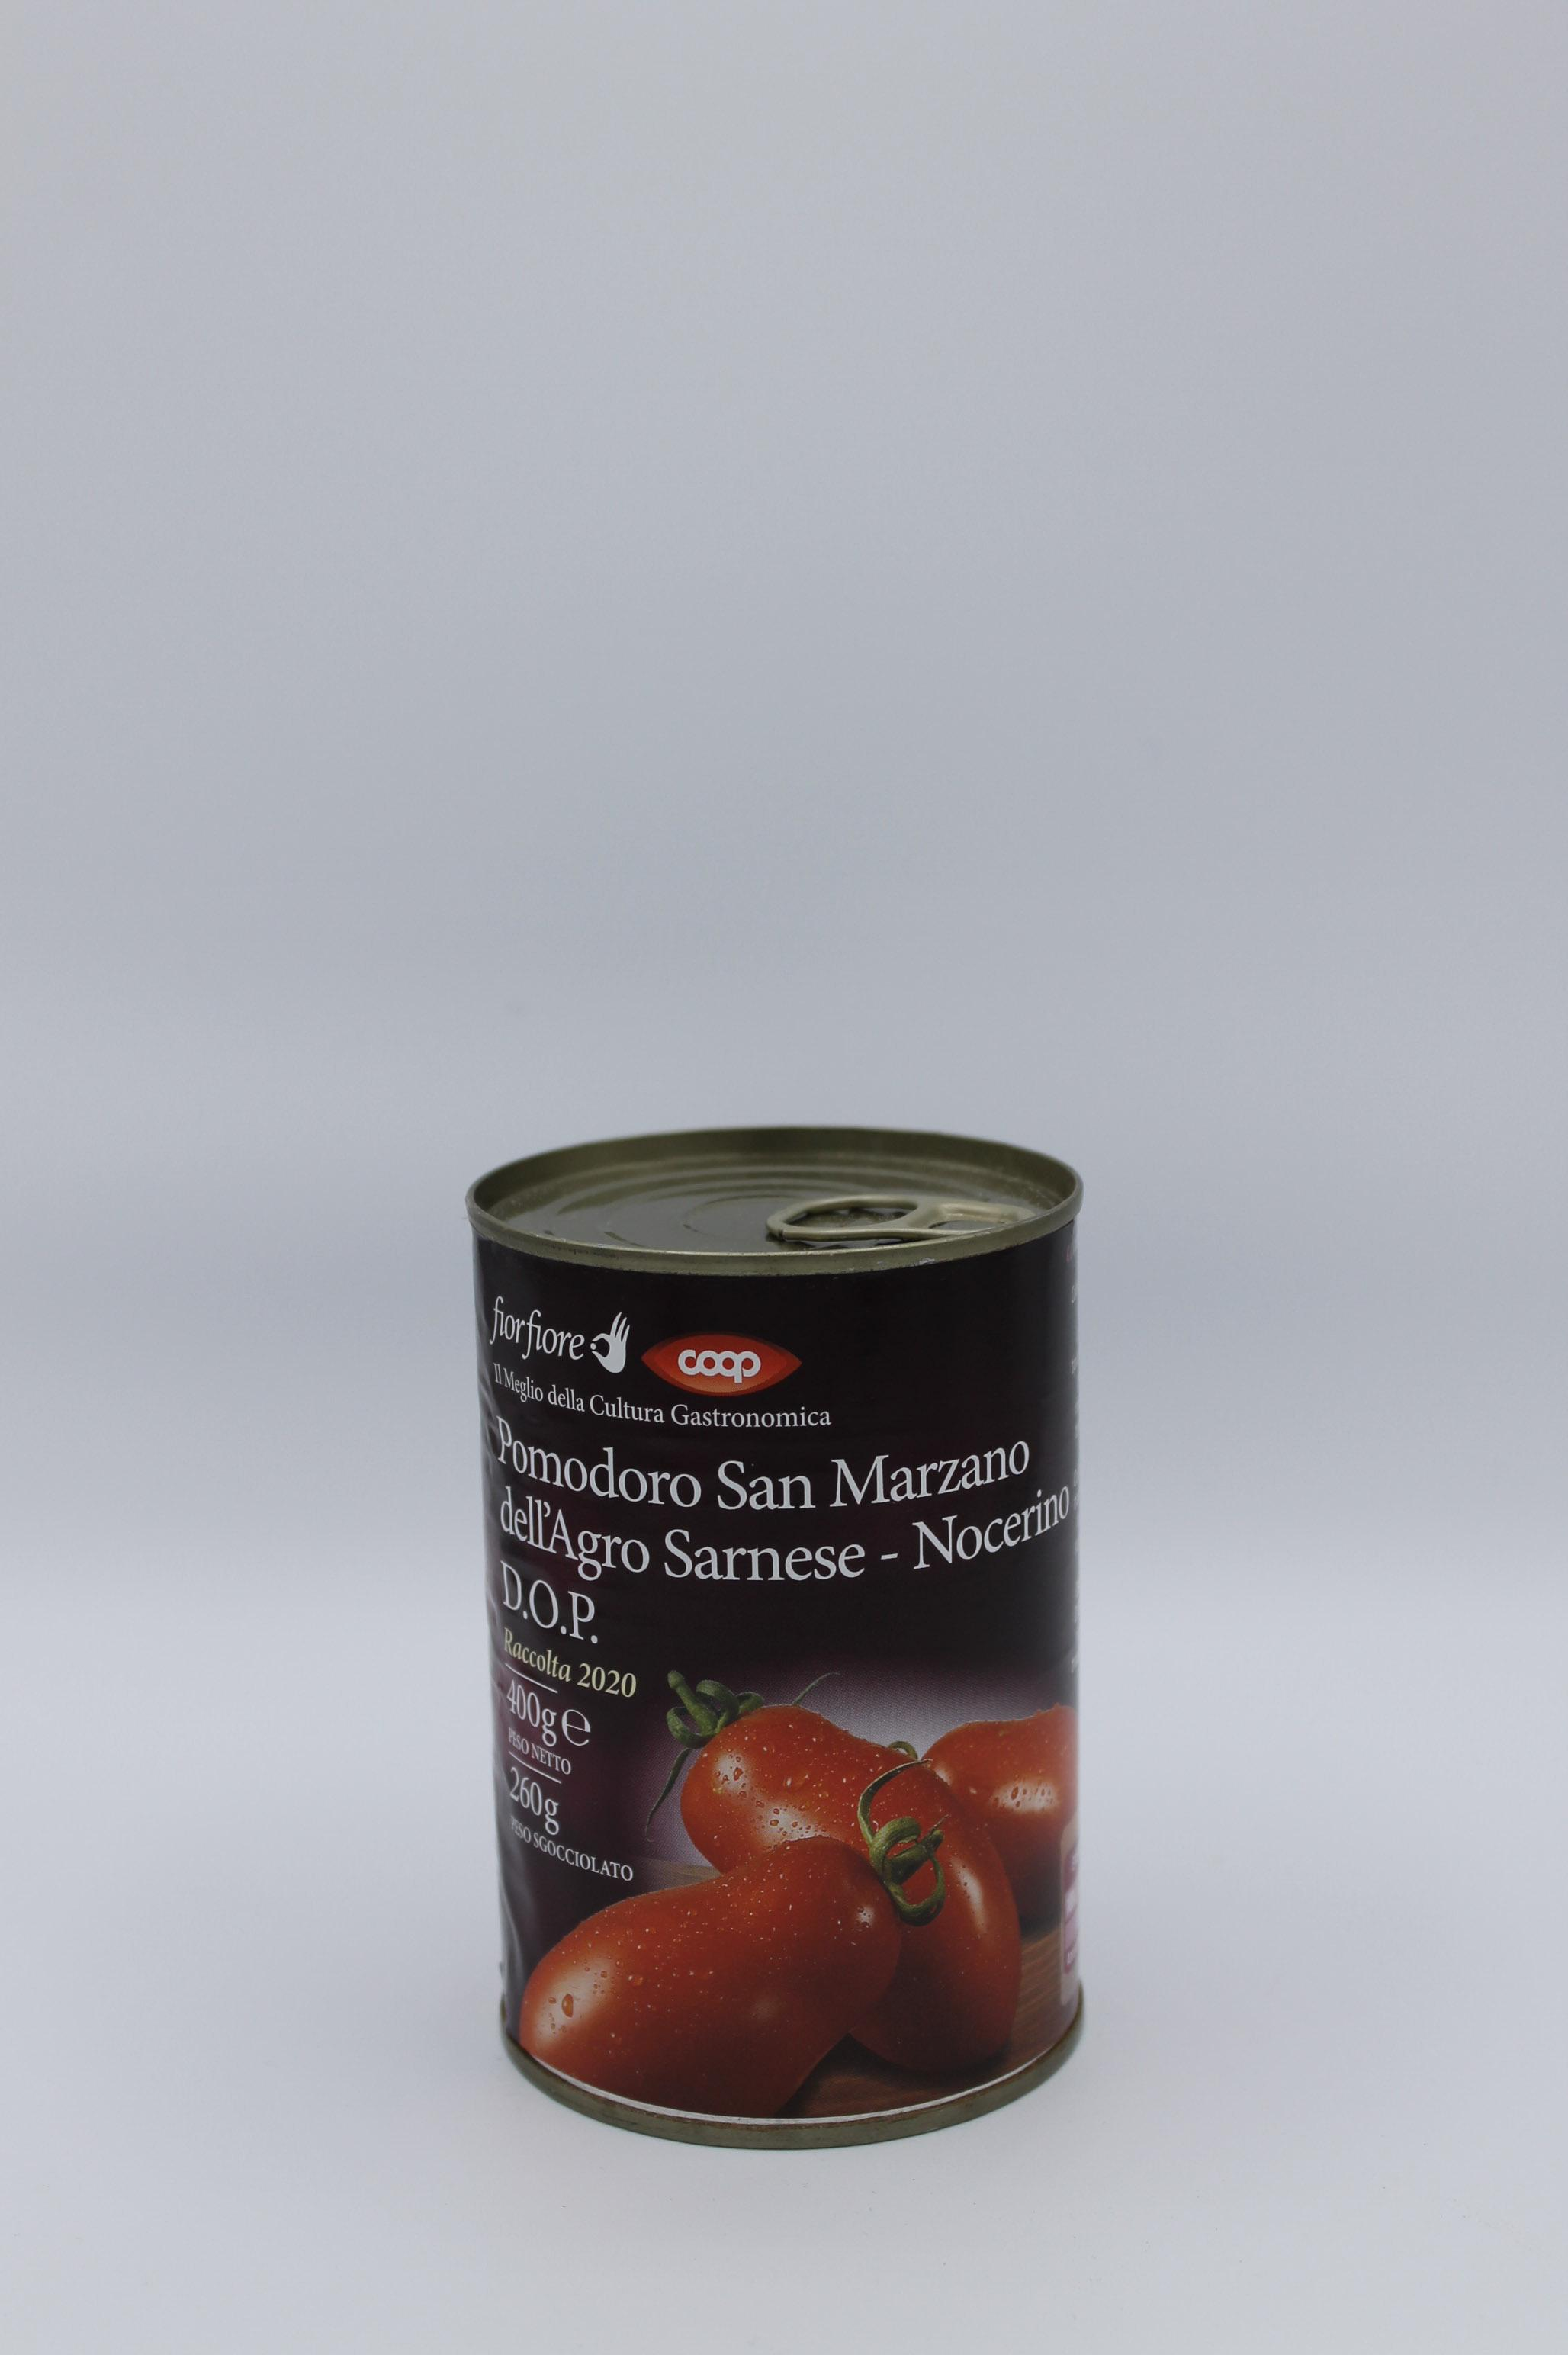 Pomodoro san marzano fior fiore coop 400 gr